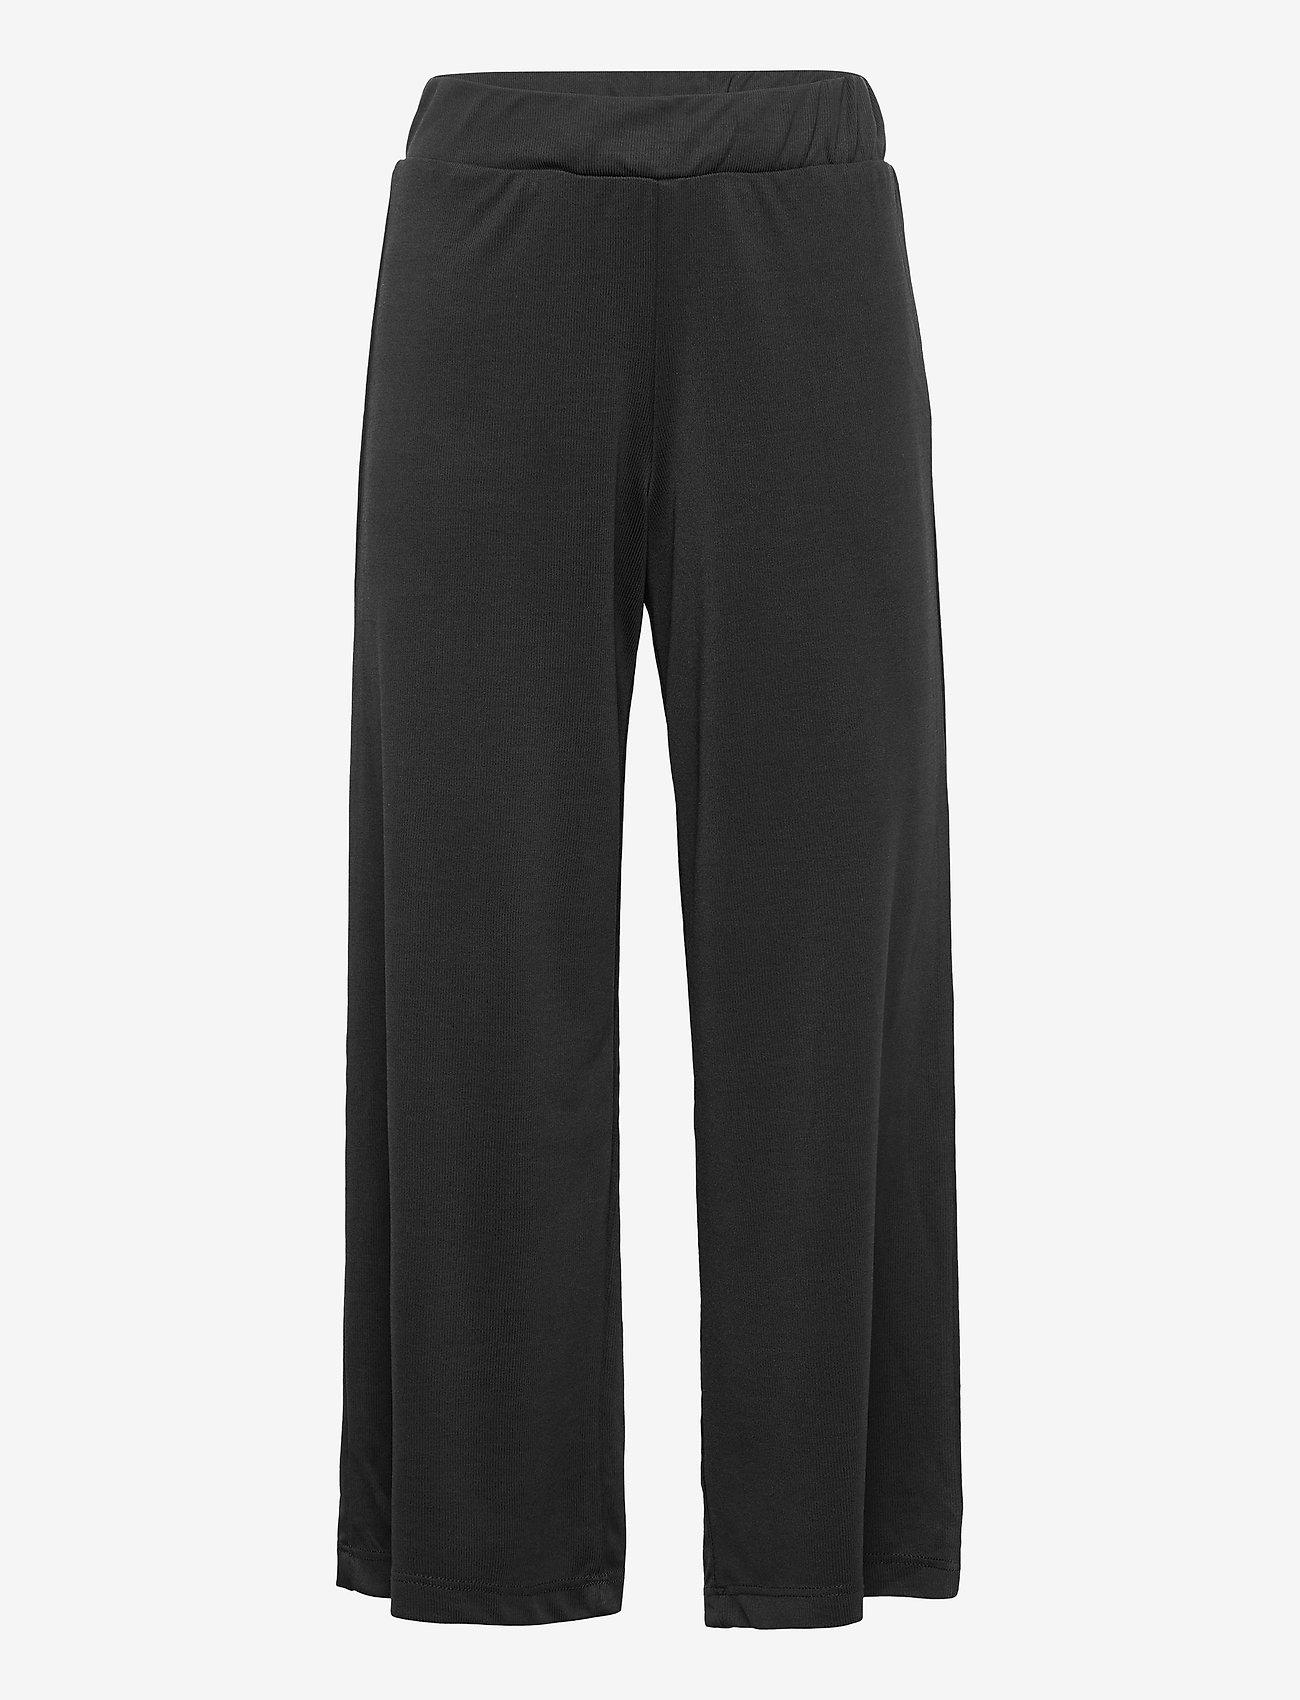 name it - NKFBANSIA WIDE PANTS - trousers - black - 0